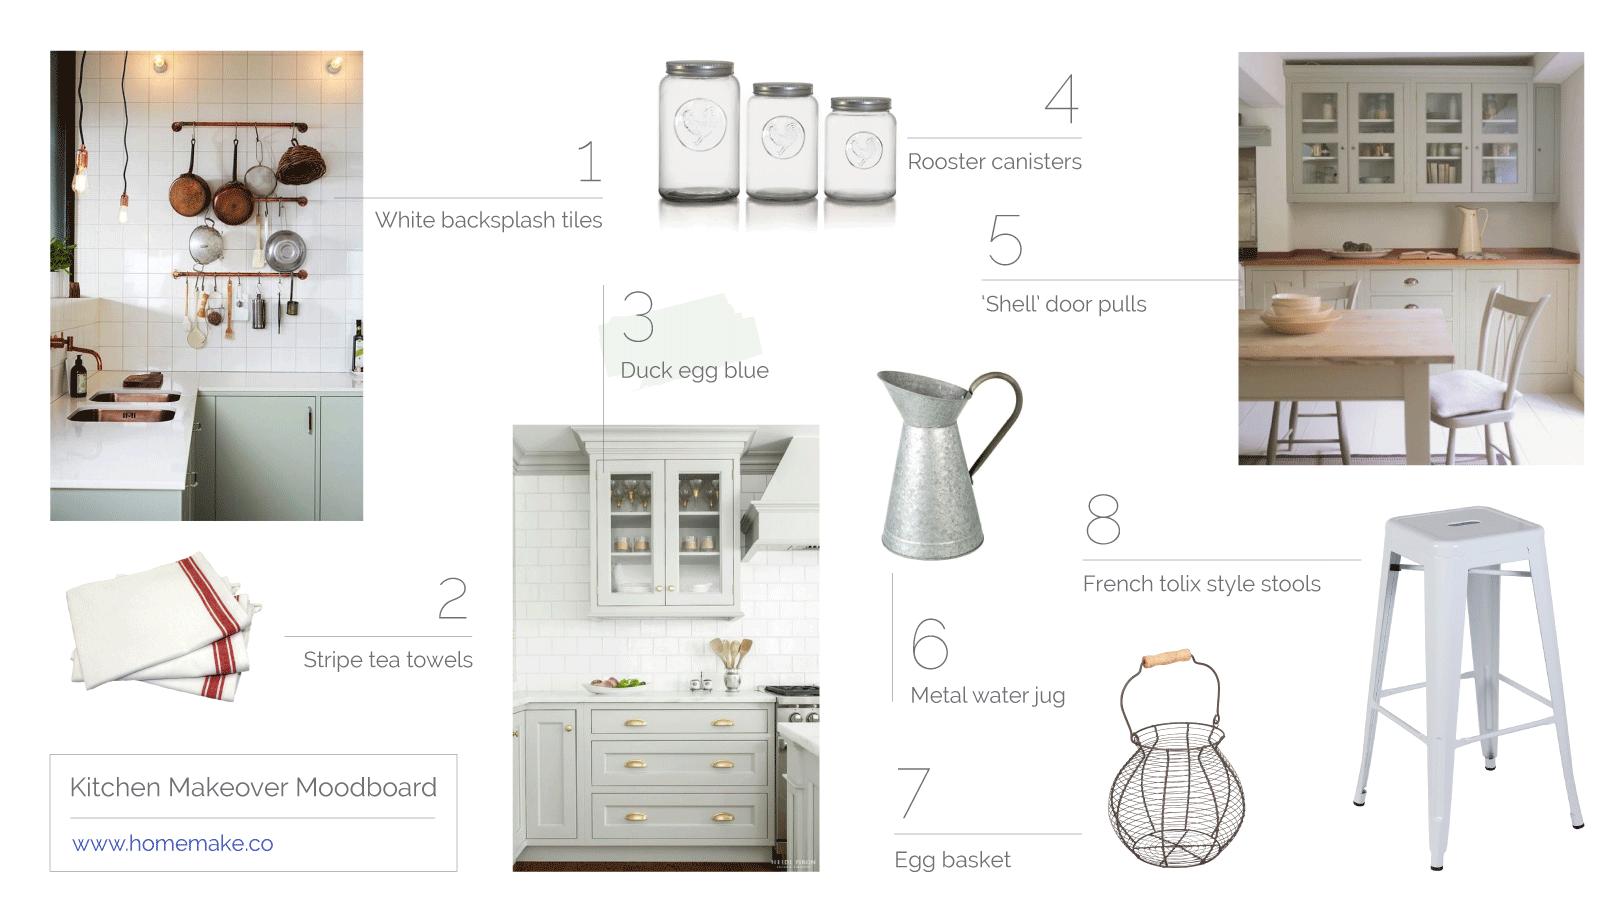 Kitchen moodboard